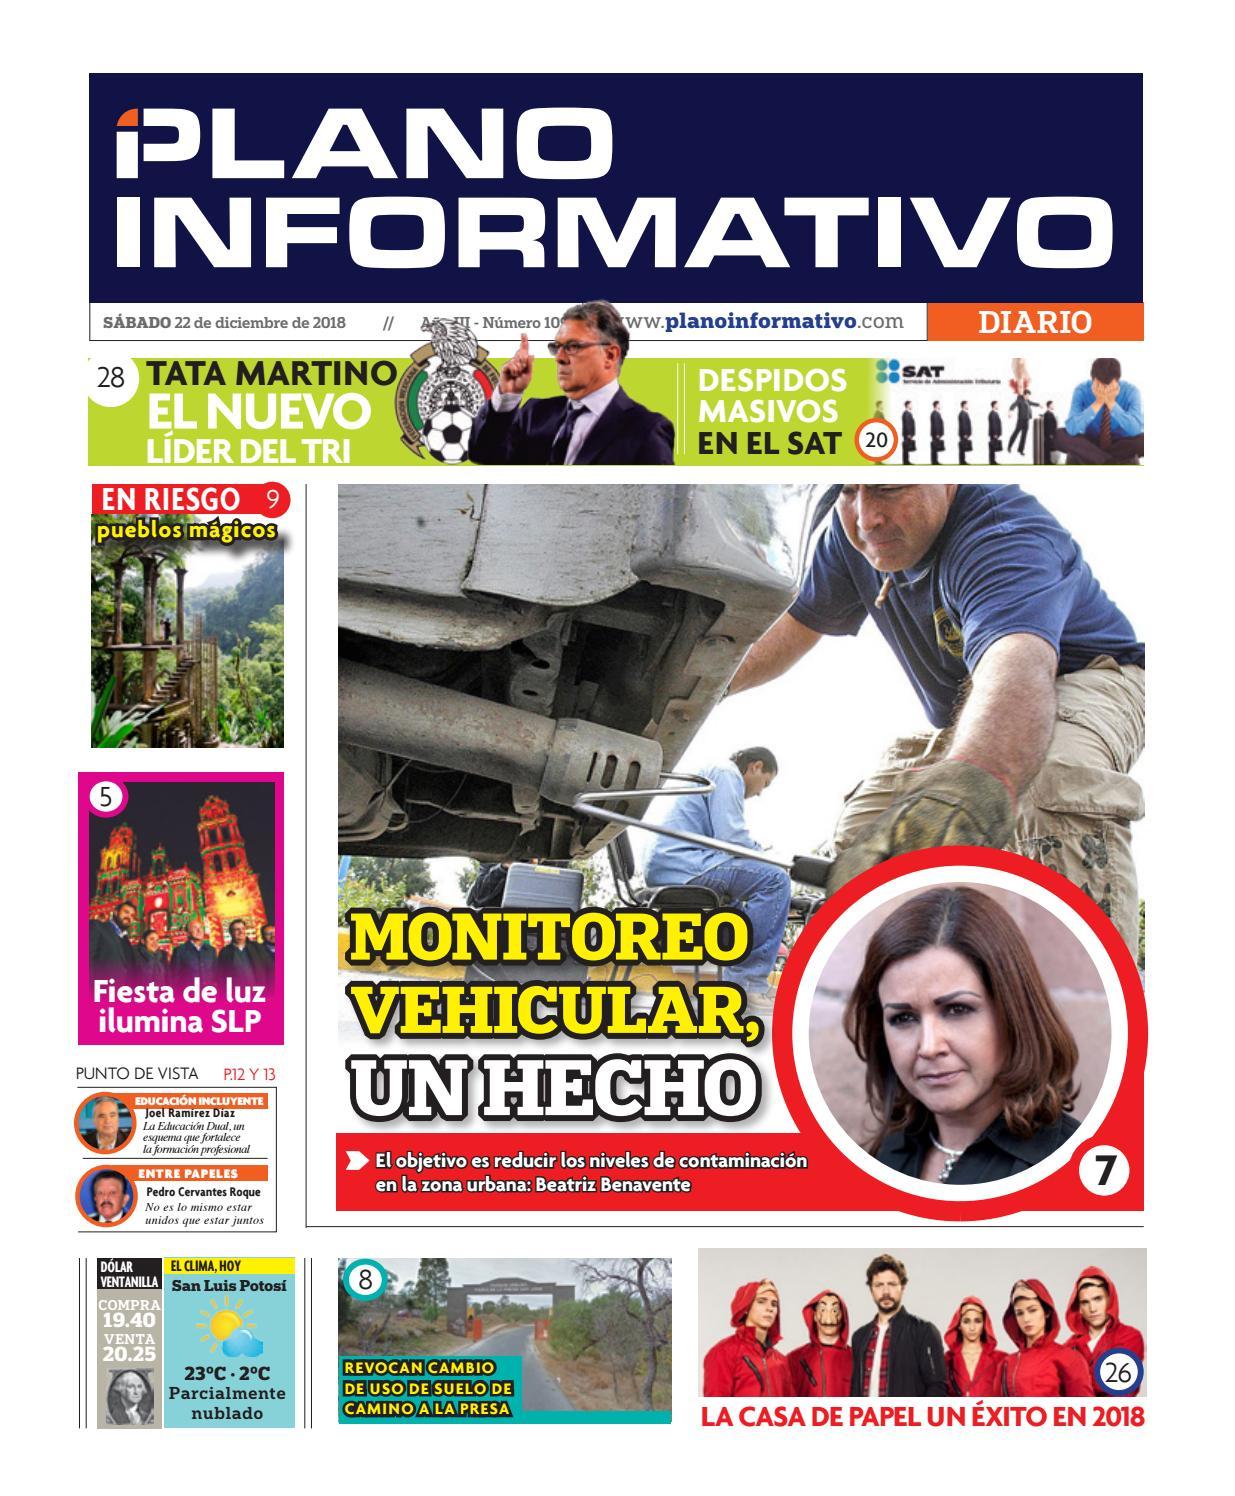 sale retailer 4db35 c4b51 Plano Informativo Impreso Año 3 No. 1096 by Plano Informativo - issuu